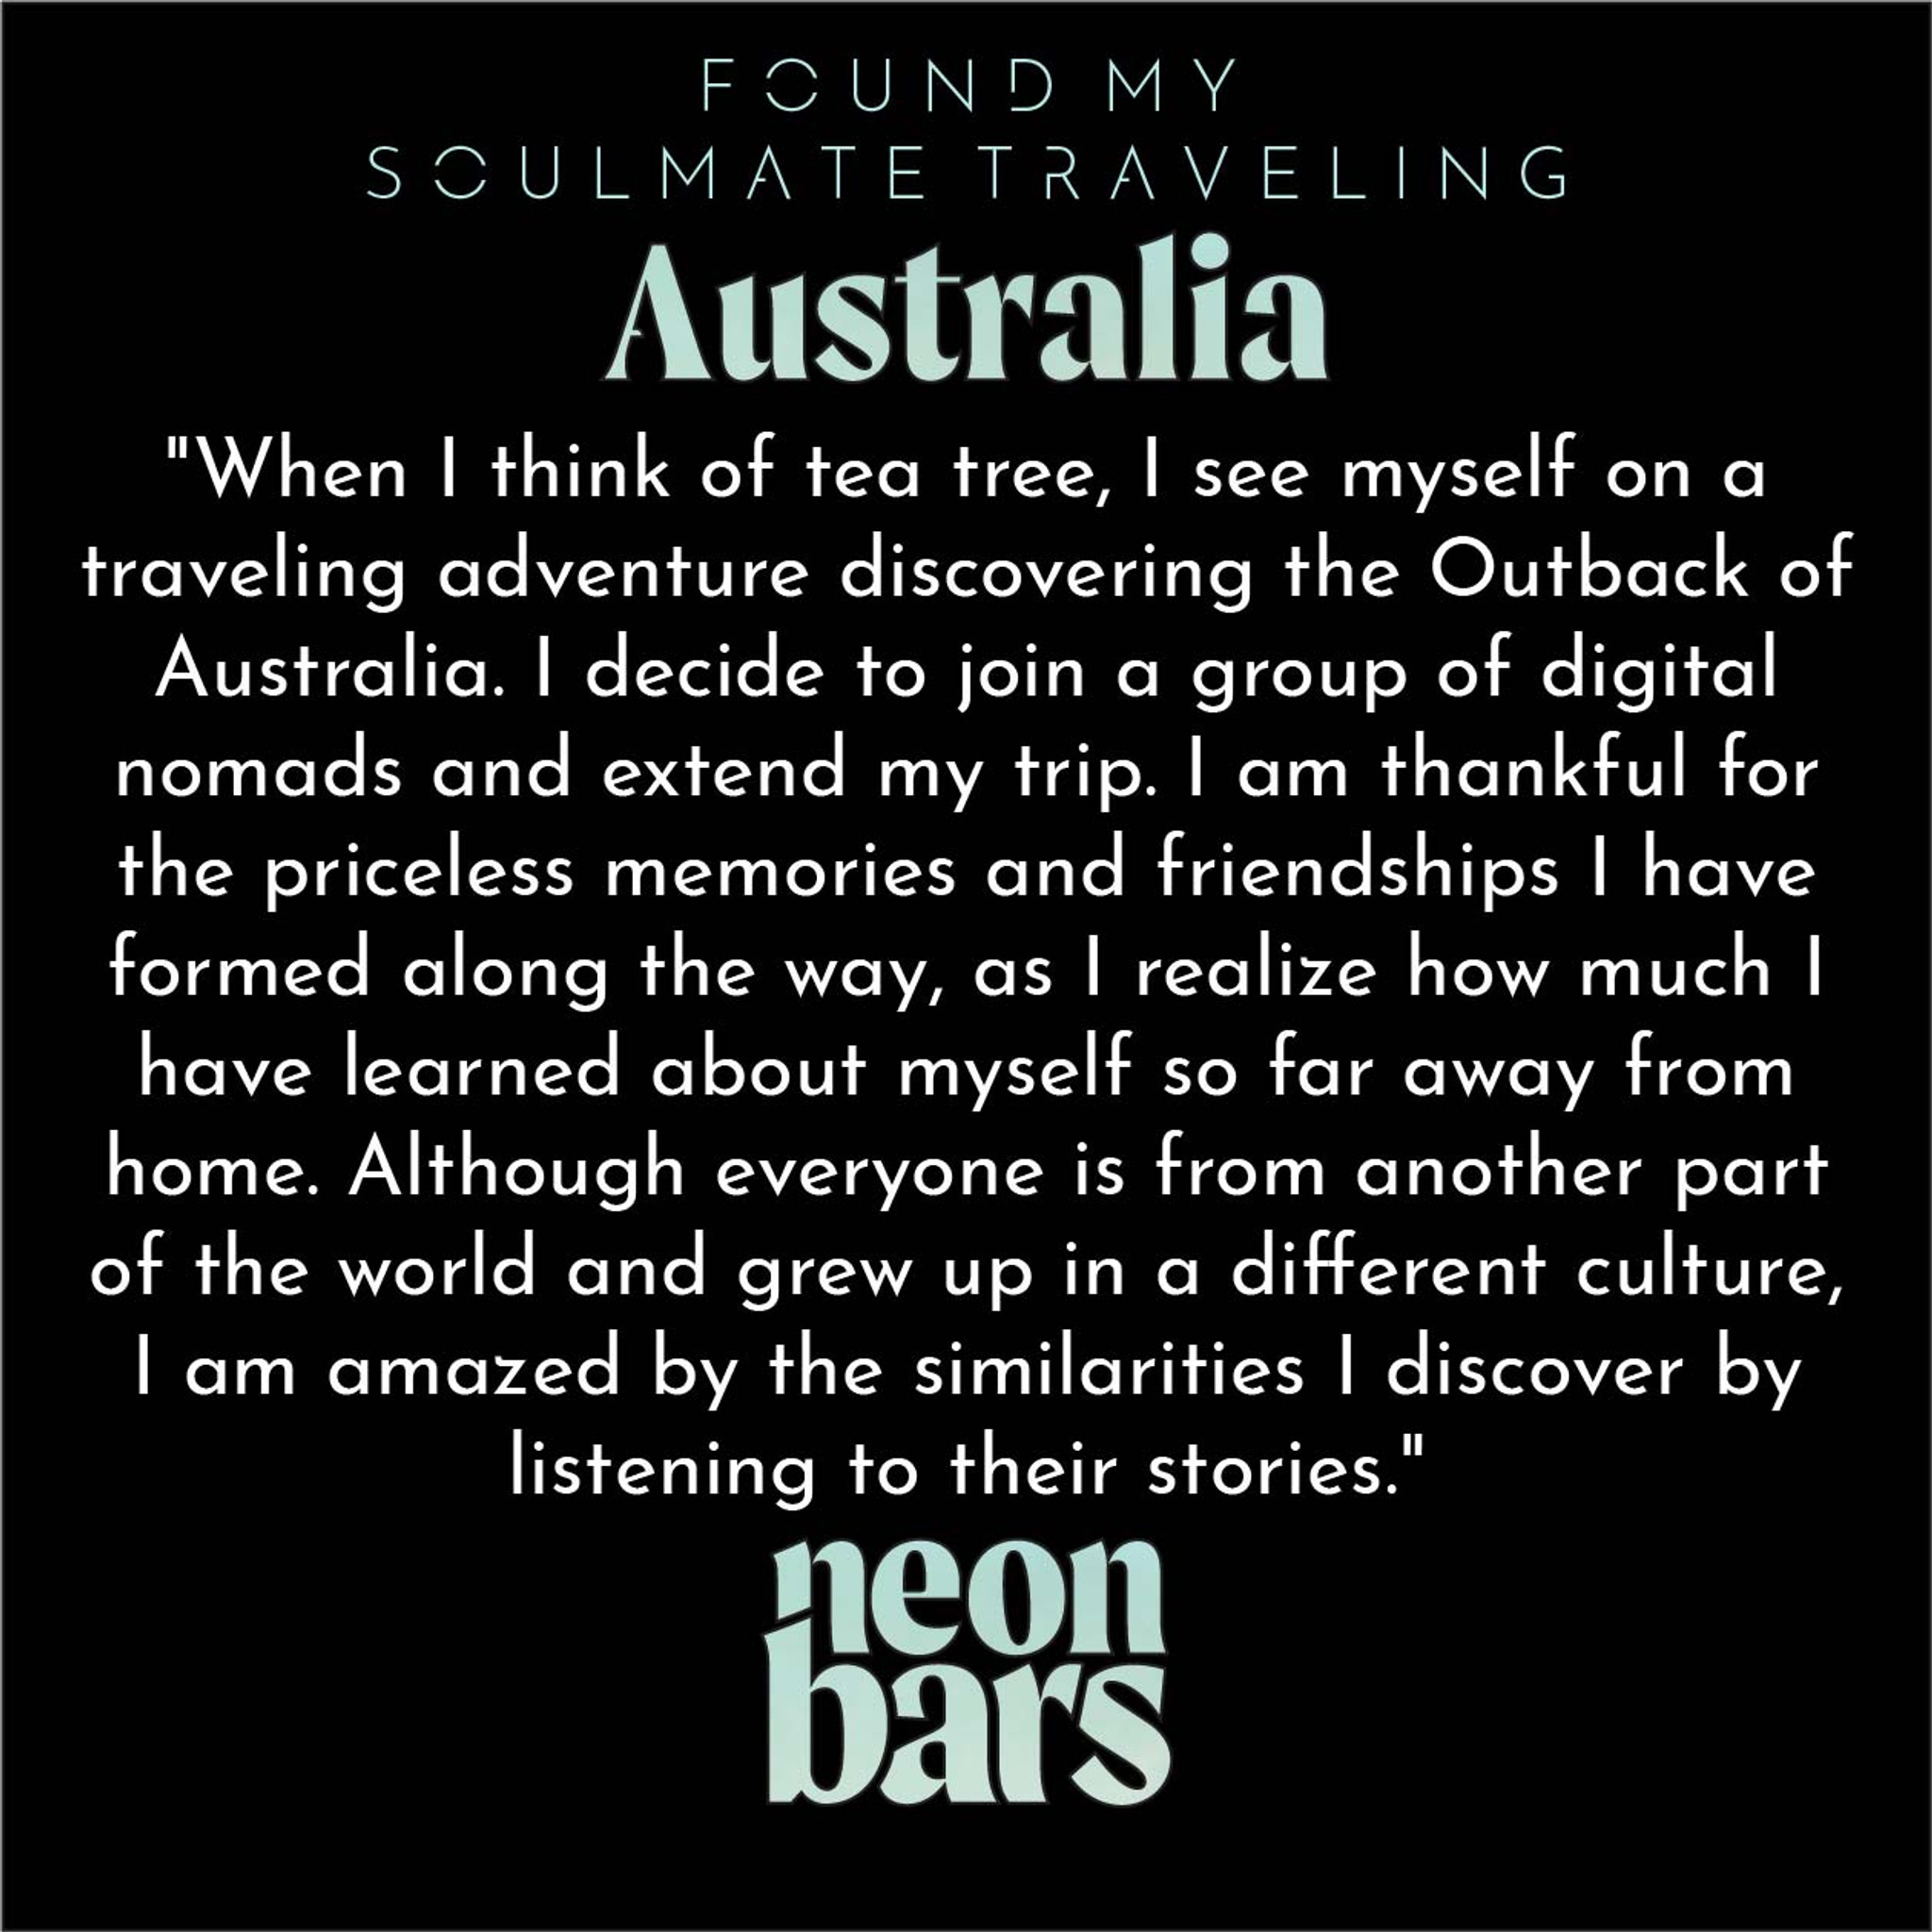 found my soulmate traveling Australia